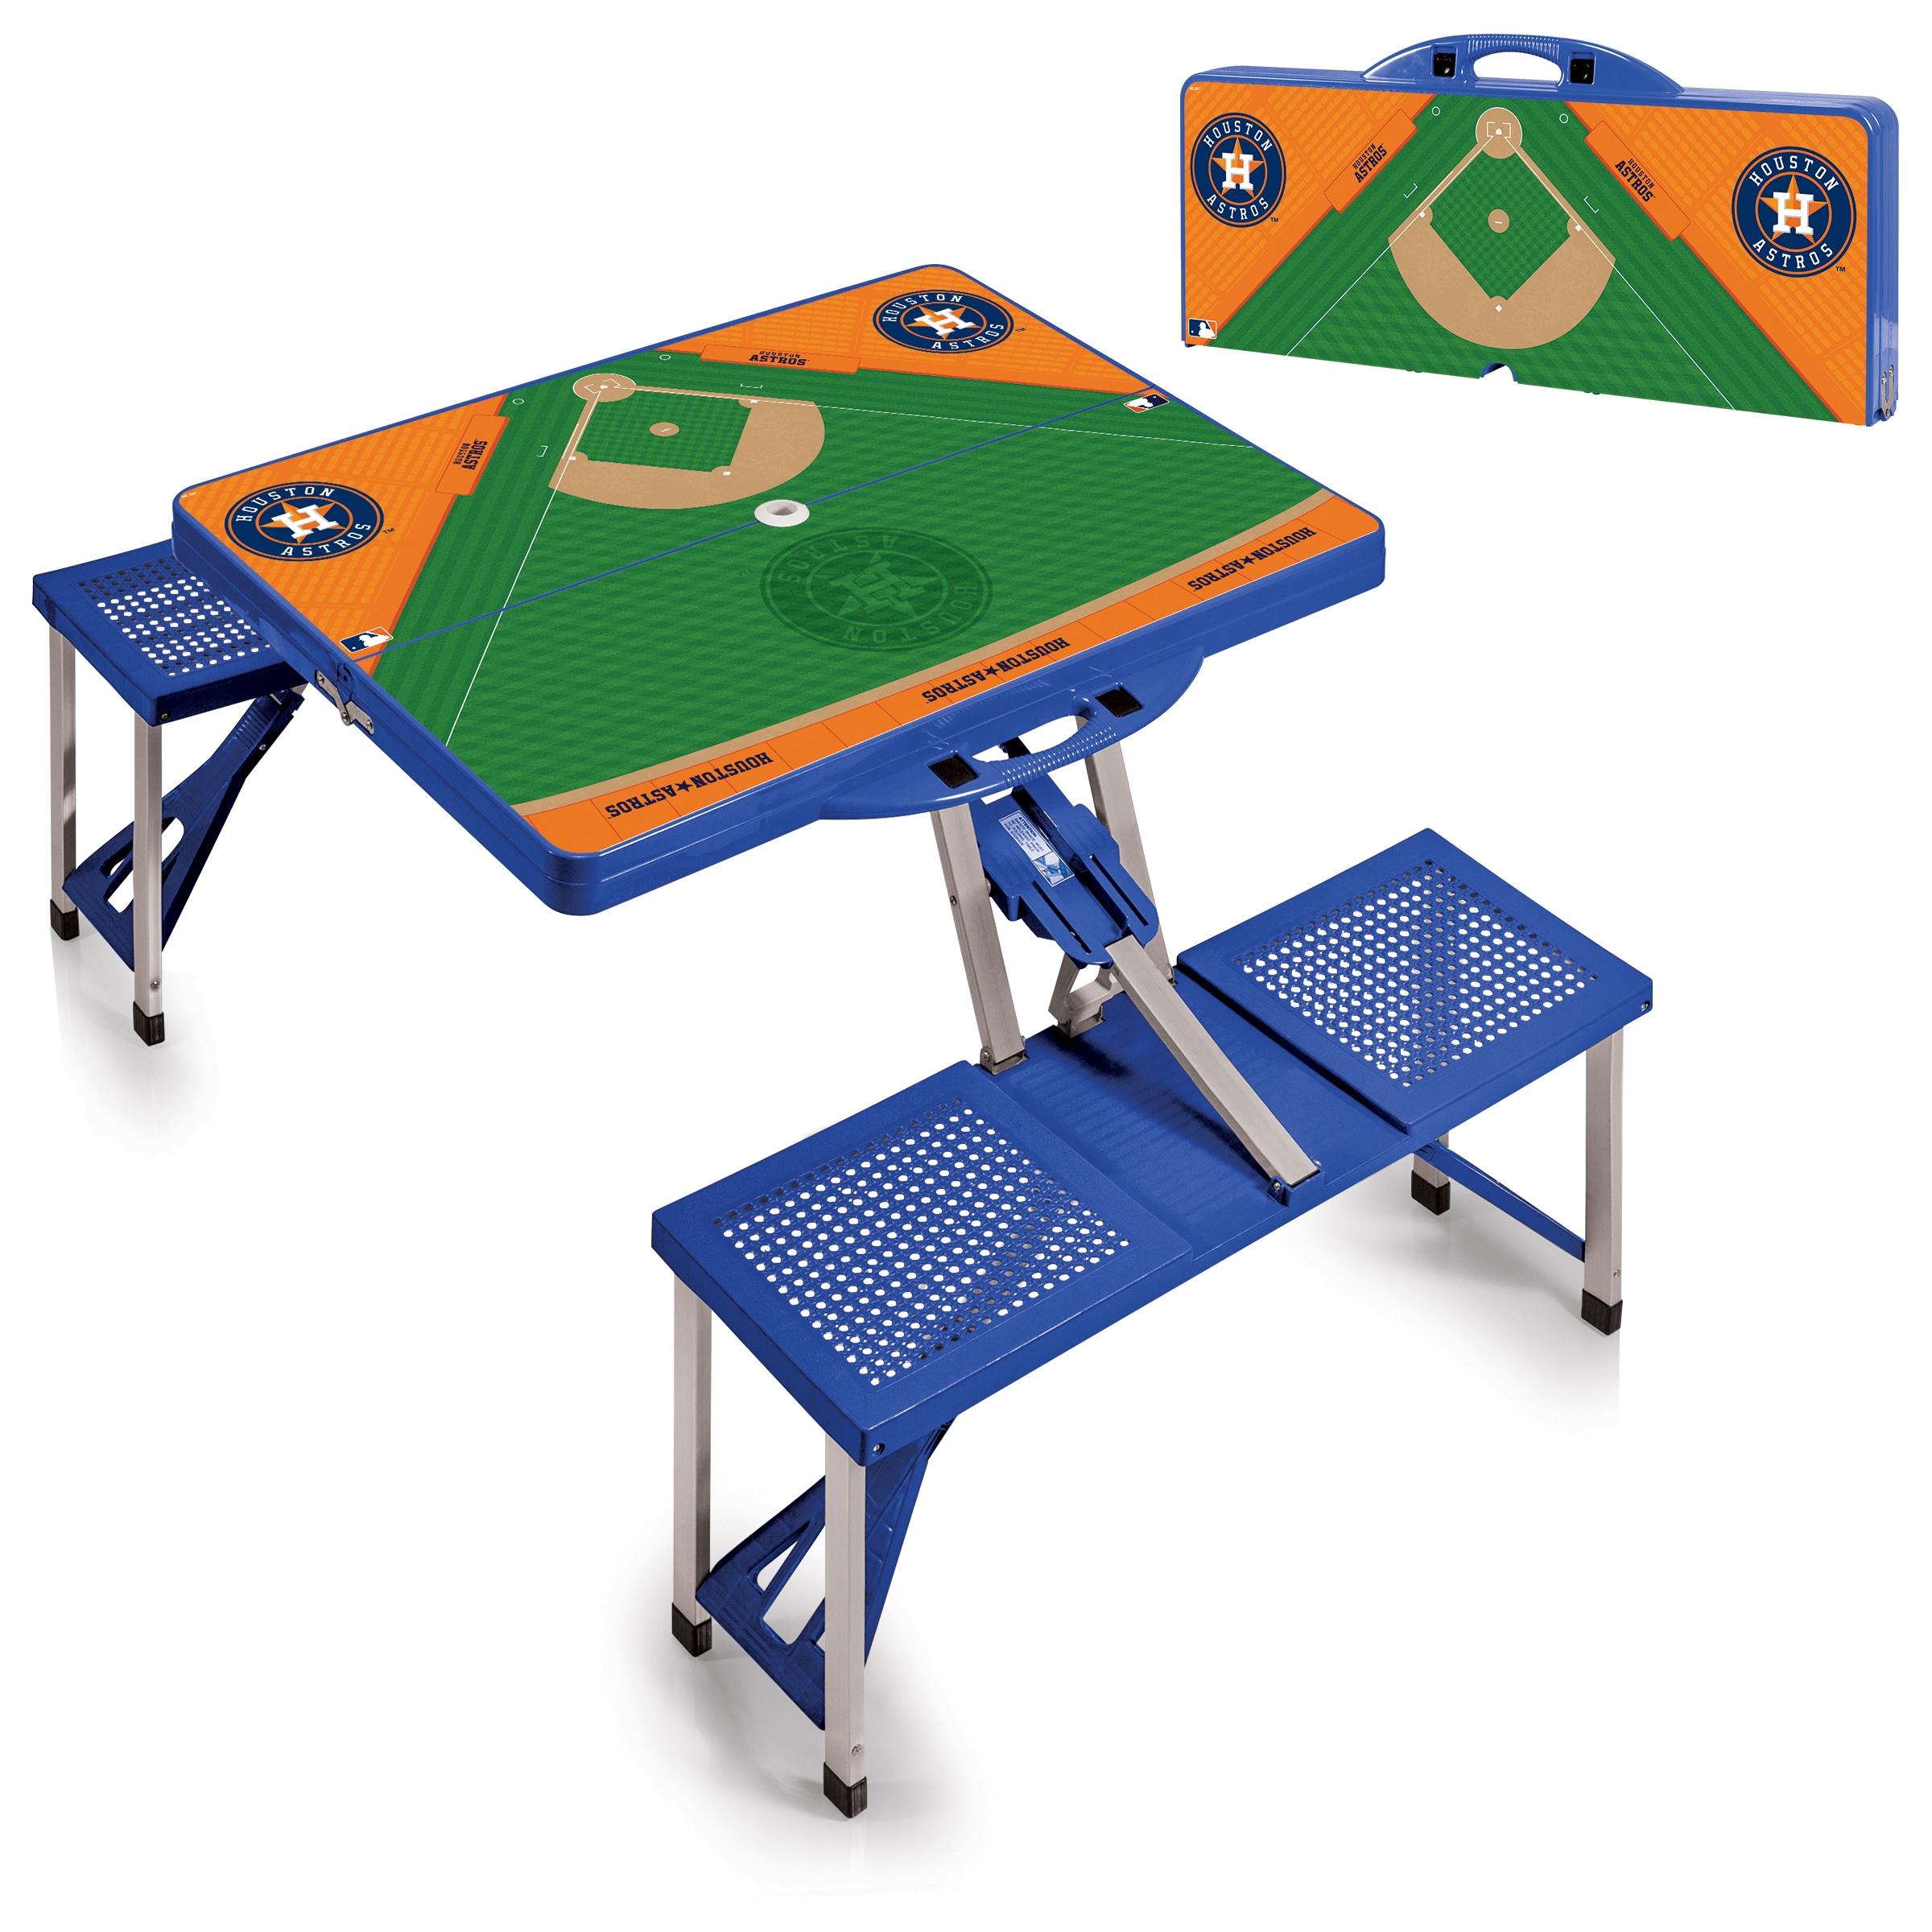 Houston Astros Field Portable Picnic Table - Blue